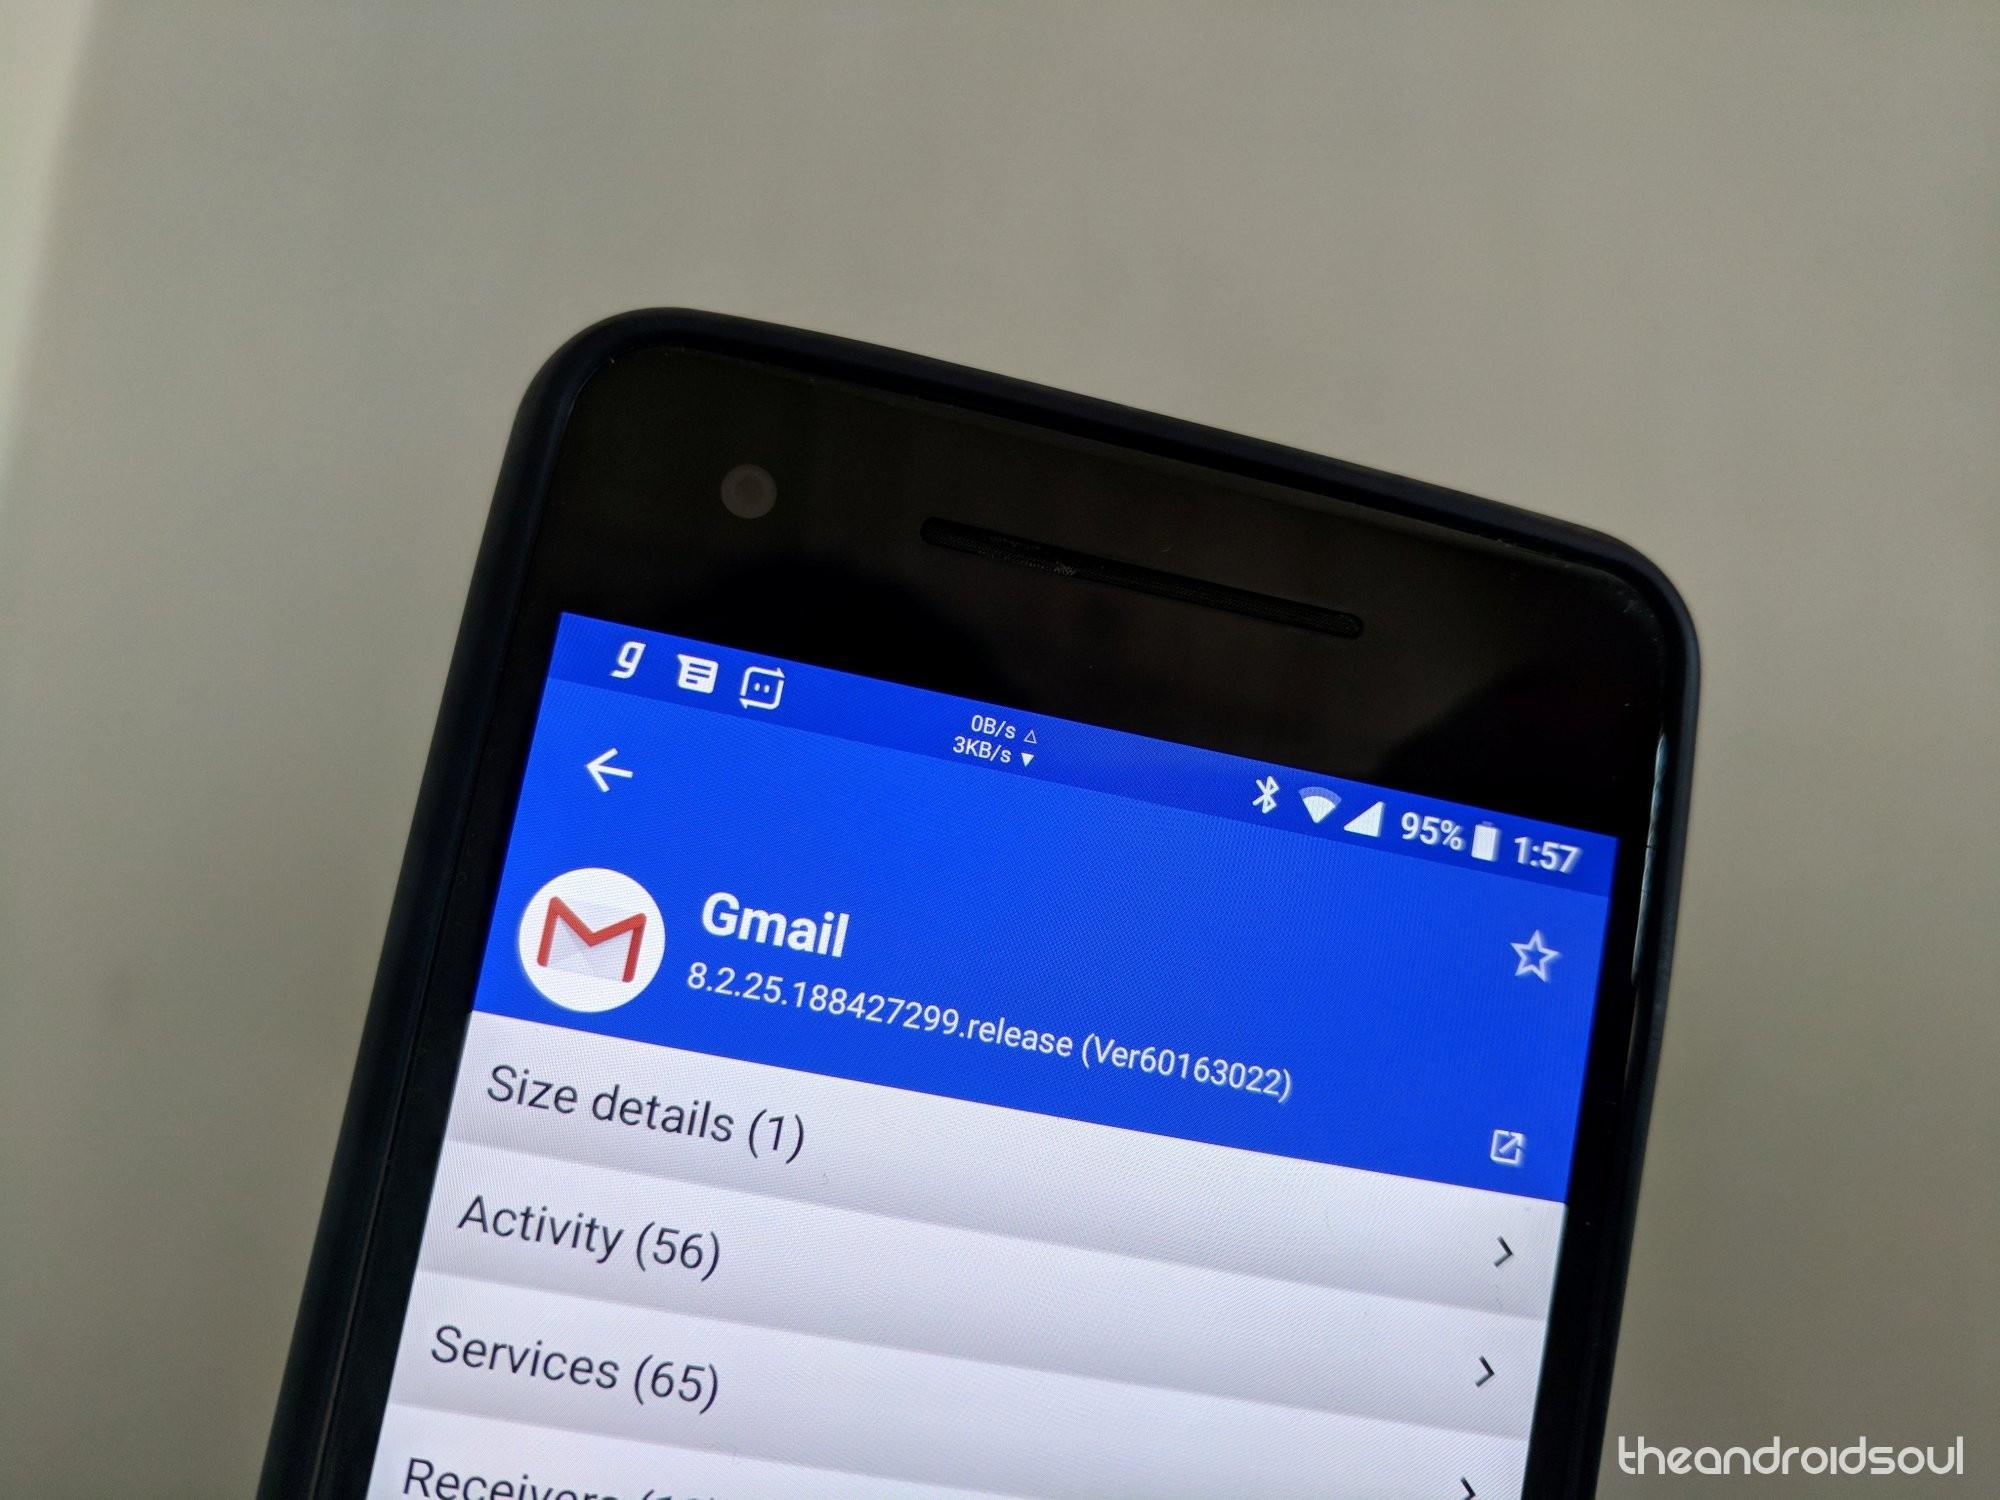 Gmail 8.2.25